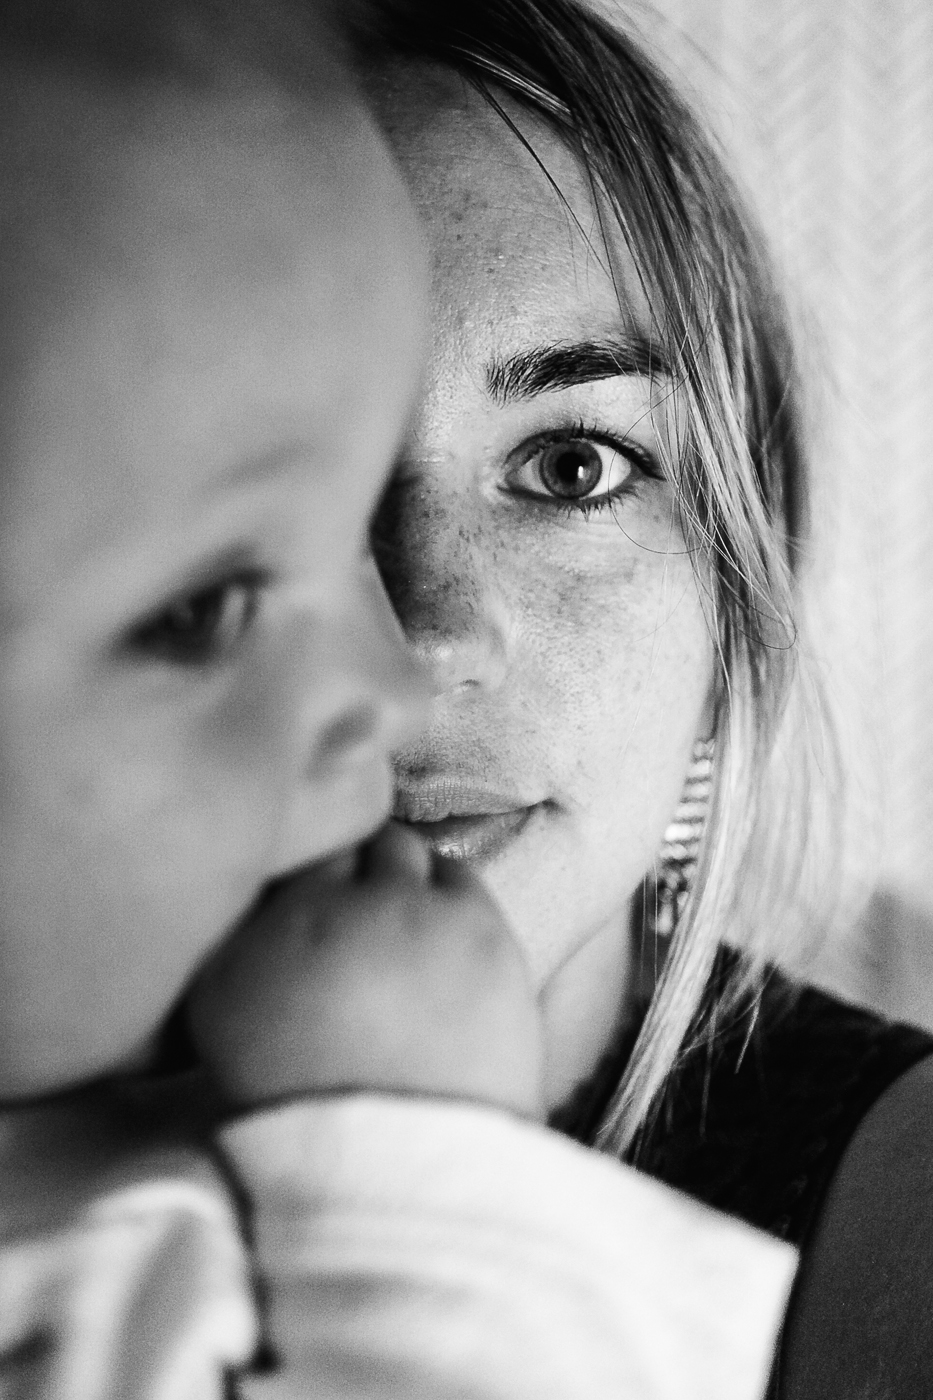 'Baby Daze' by Erica Caligiuri